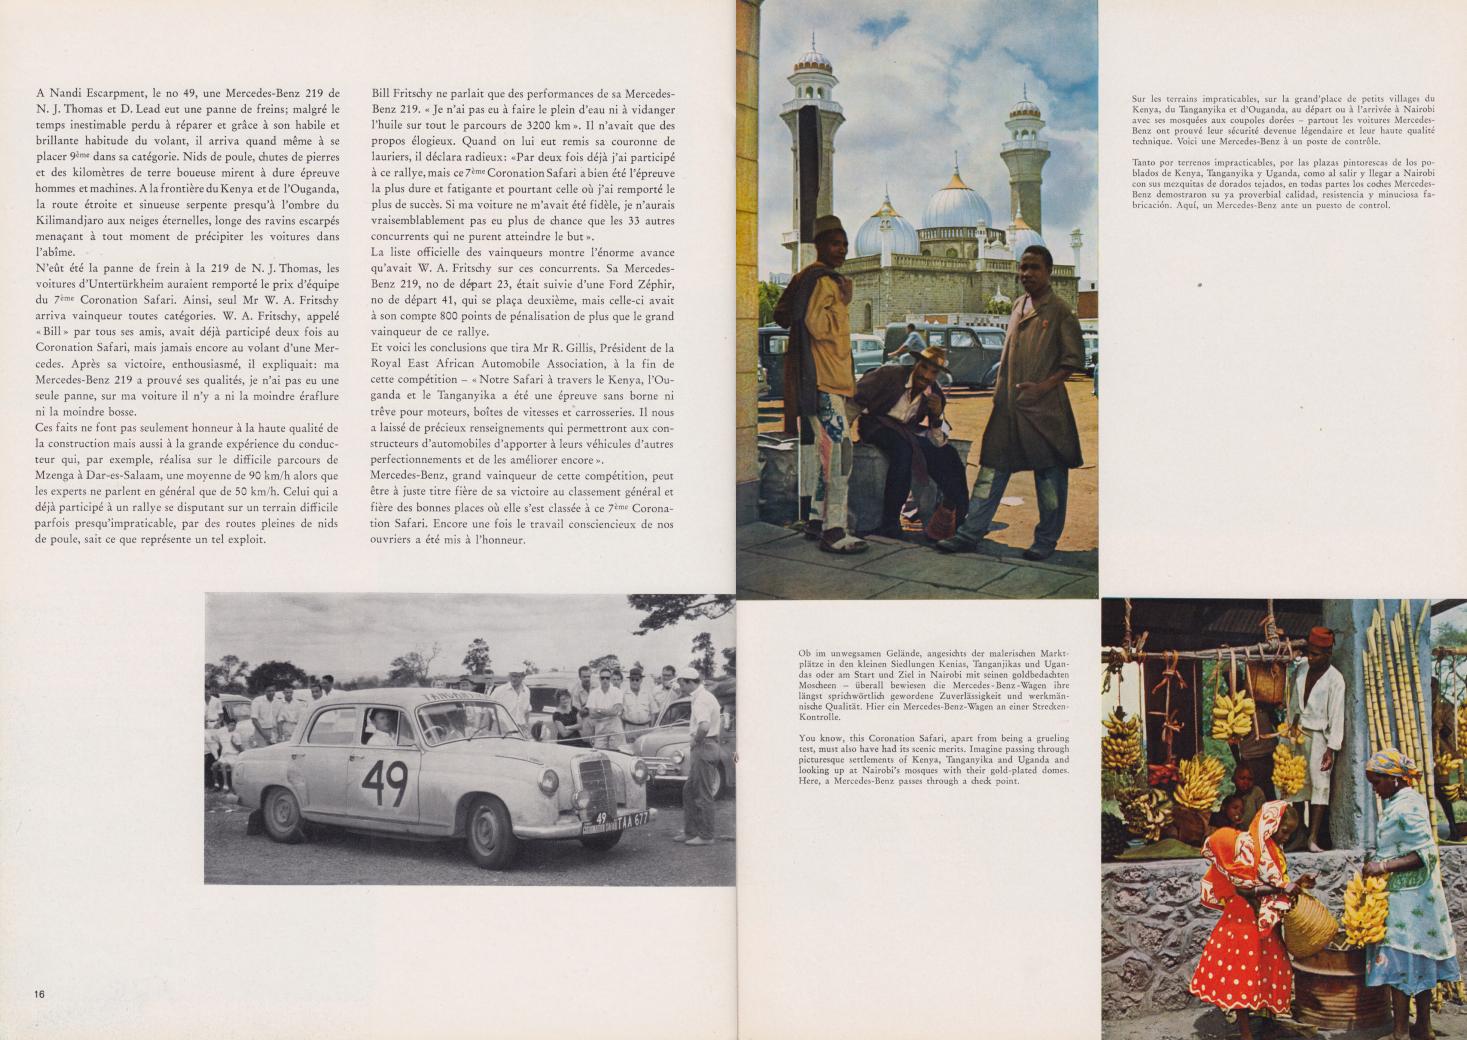 (REVISTA): Periódico In aller welt n.º 33 - Mercedes-Benz no mundo - 1959 - multilingue 009